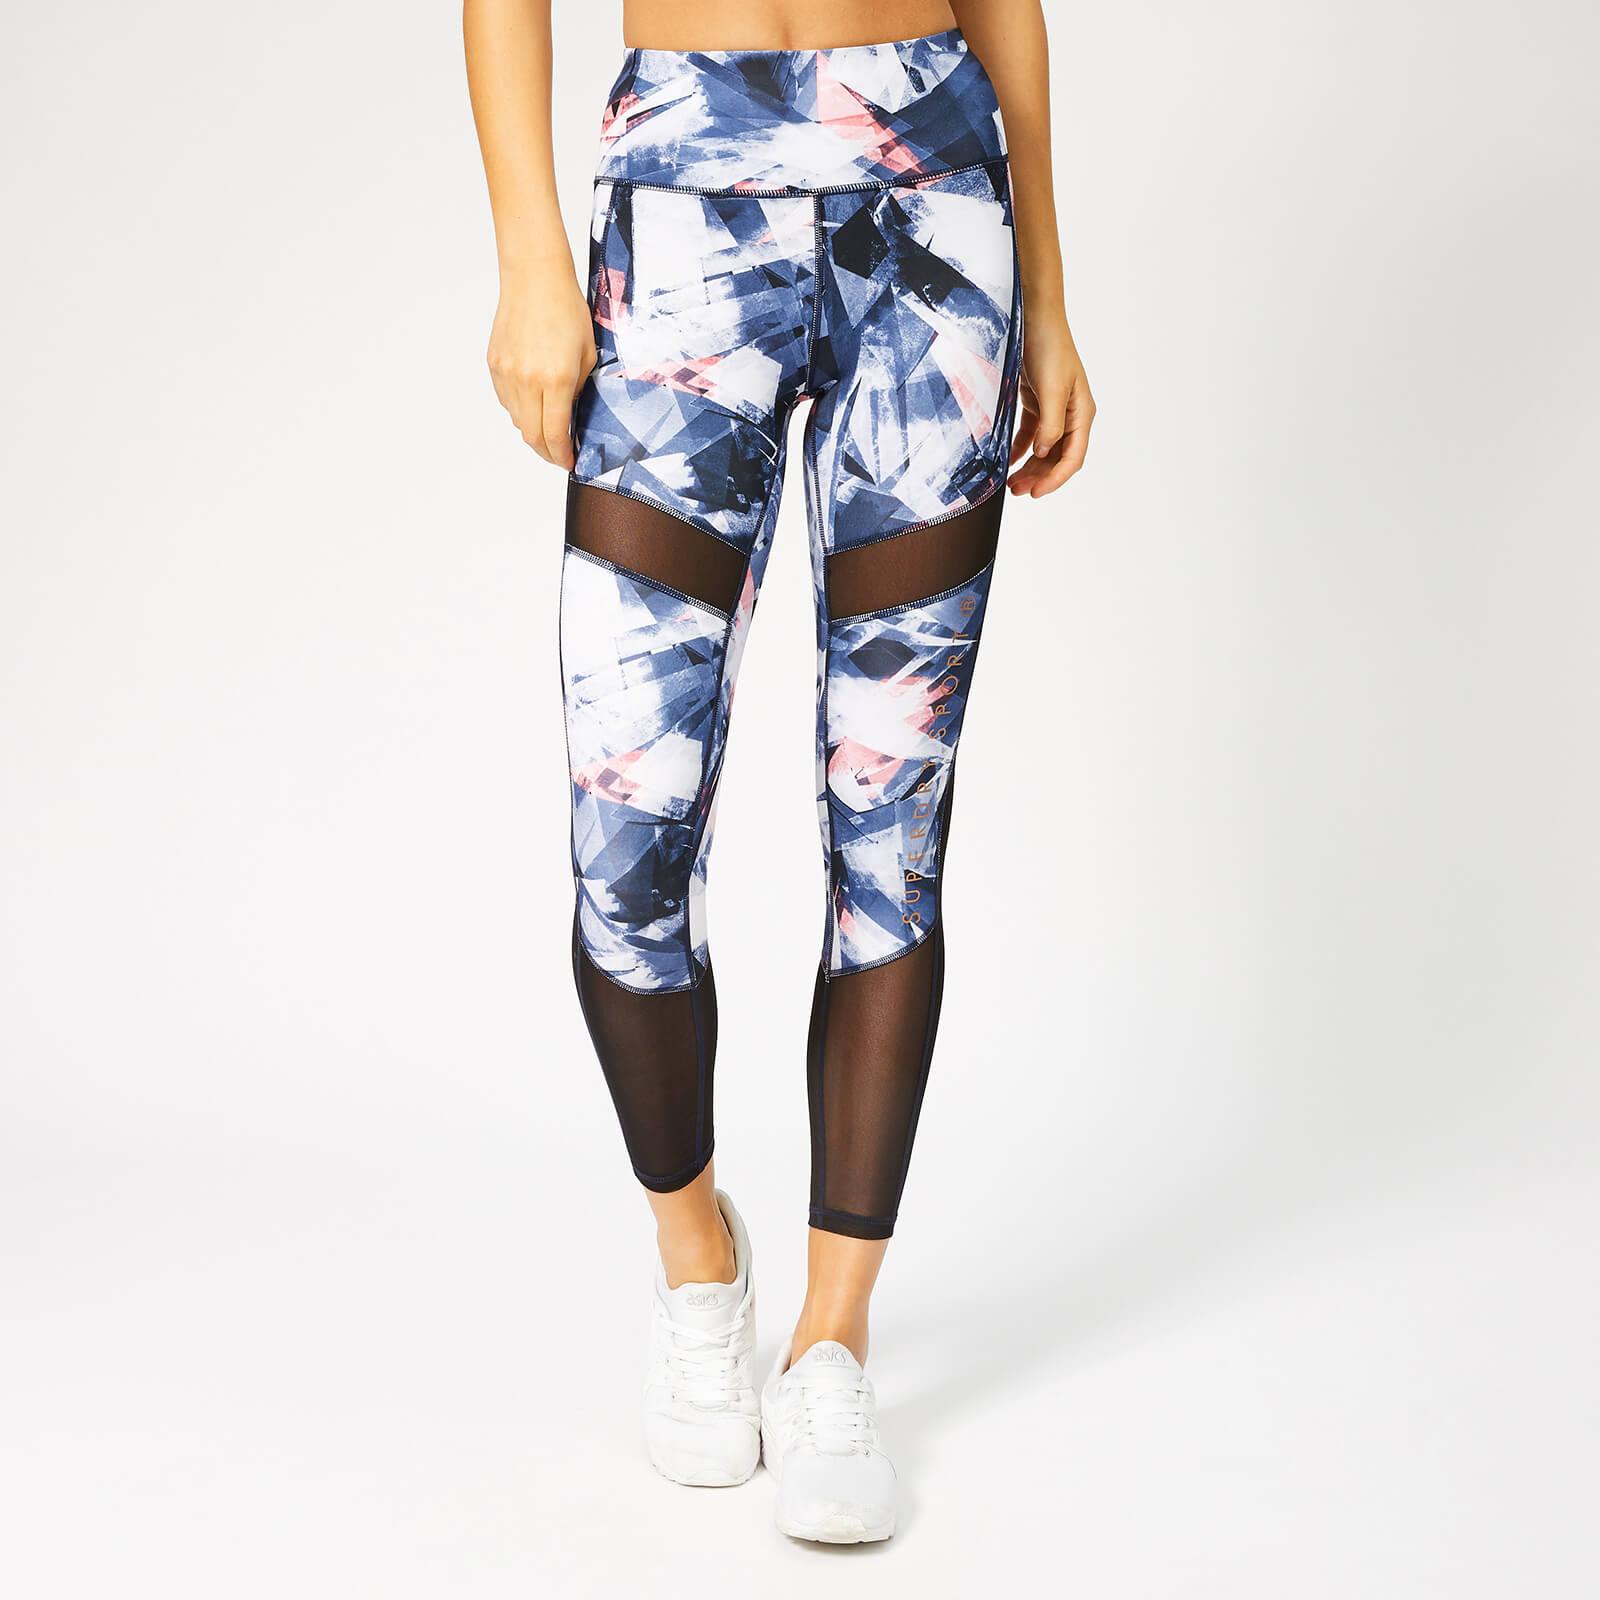 Superdry Sport Women's Active Studio Mesh Leggings - Violet Shard Print - XS - Blue